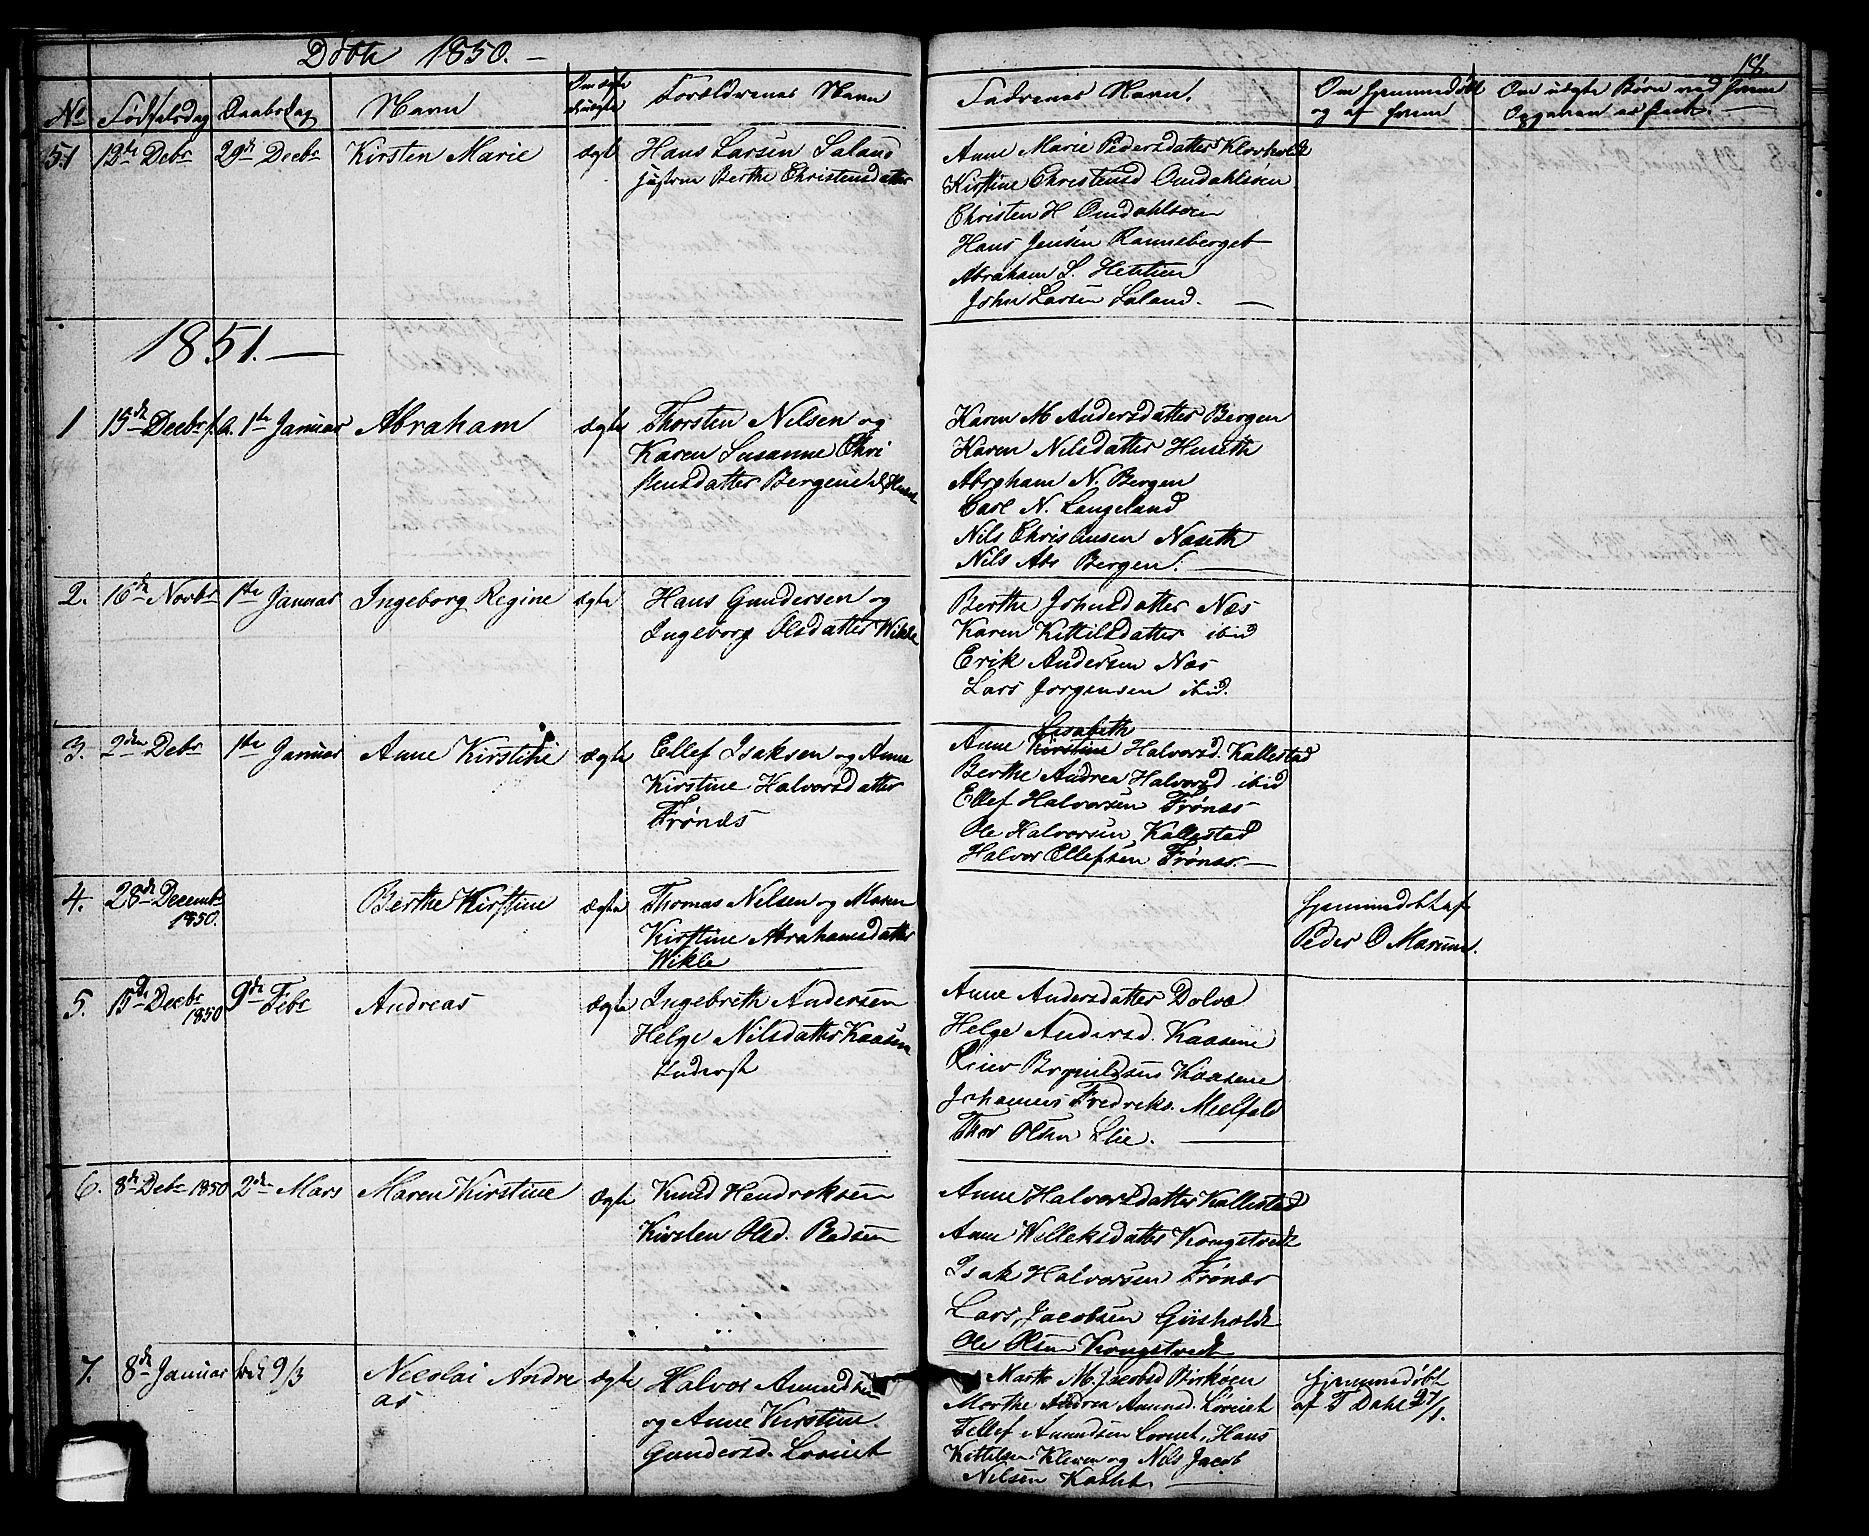 SAKO, Solum kirkebøker, G/Gb/L0001: Klokkerbok nr. II 1, 1848-1859, s. 18